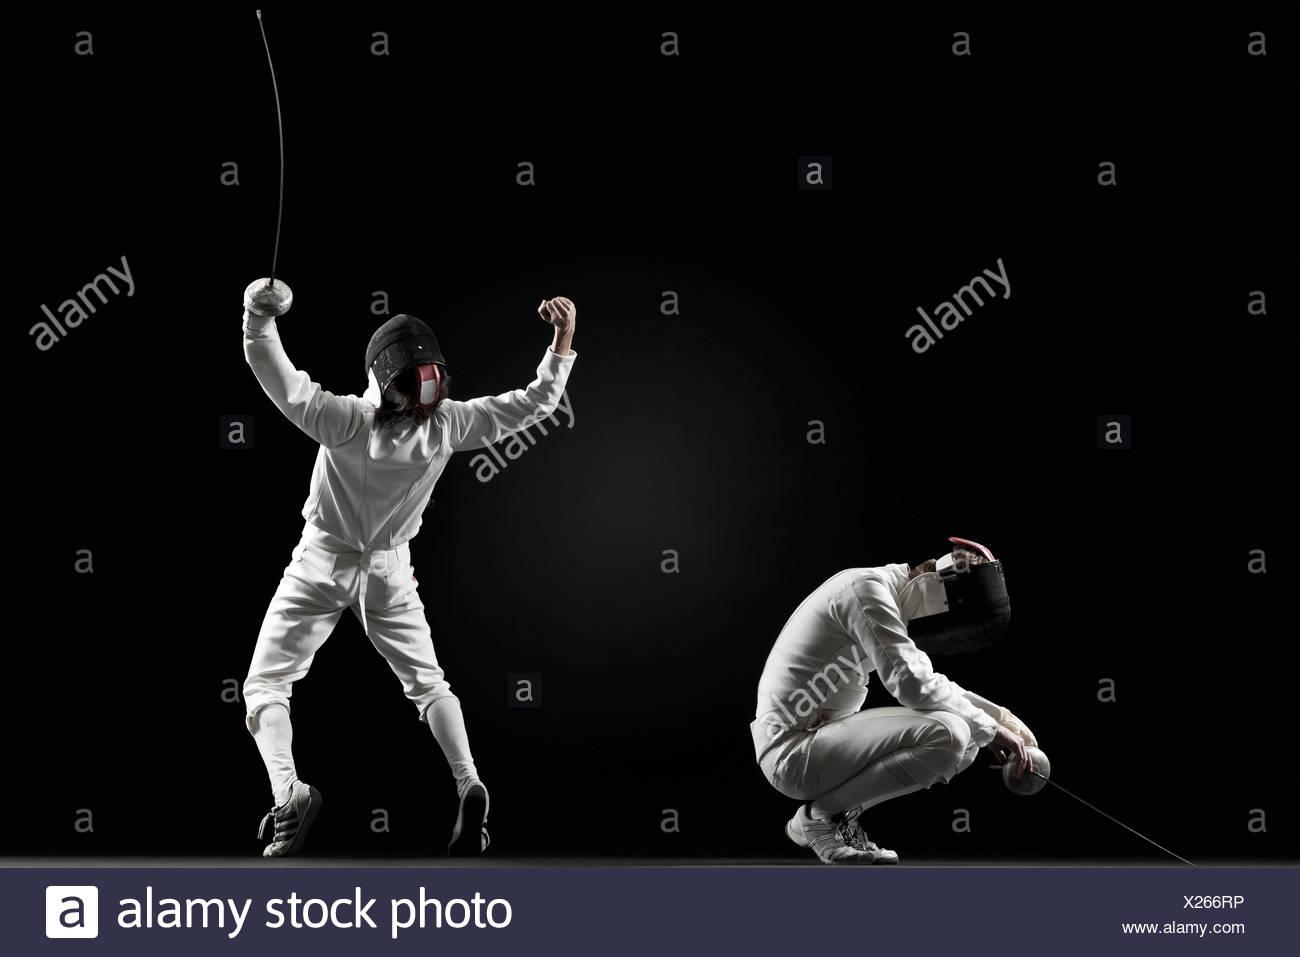 Winning fencer celebrating over defeated fencer - Stock Image